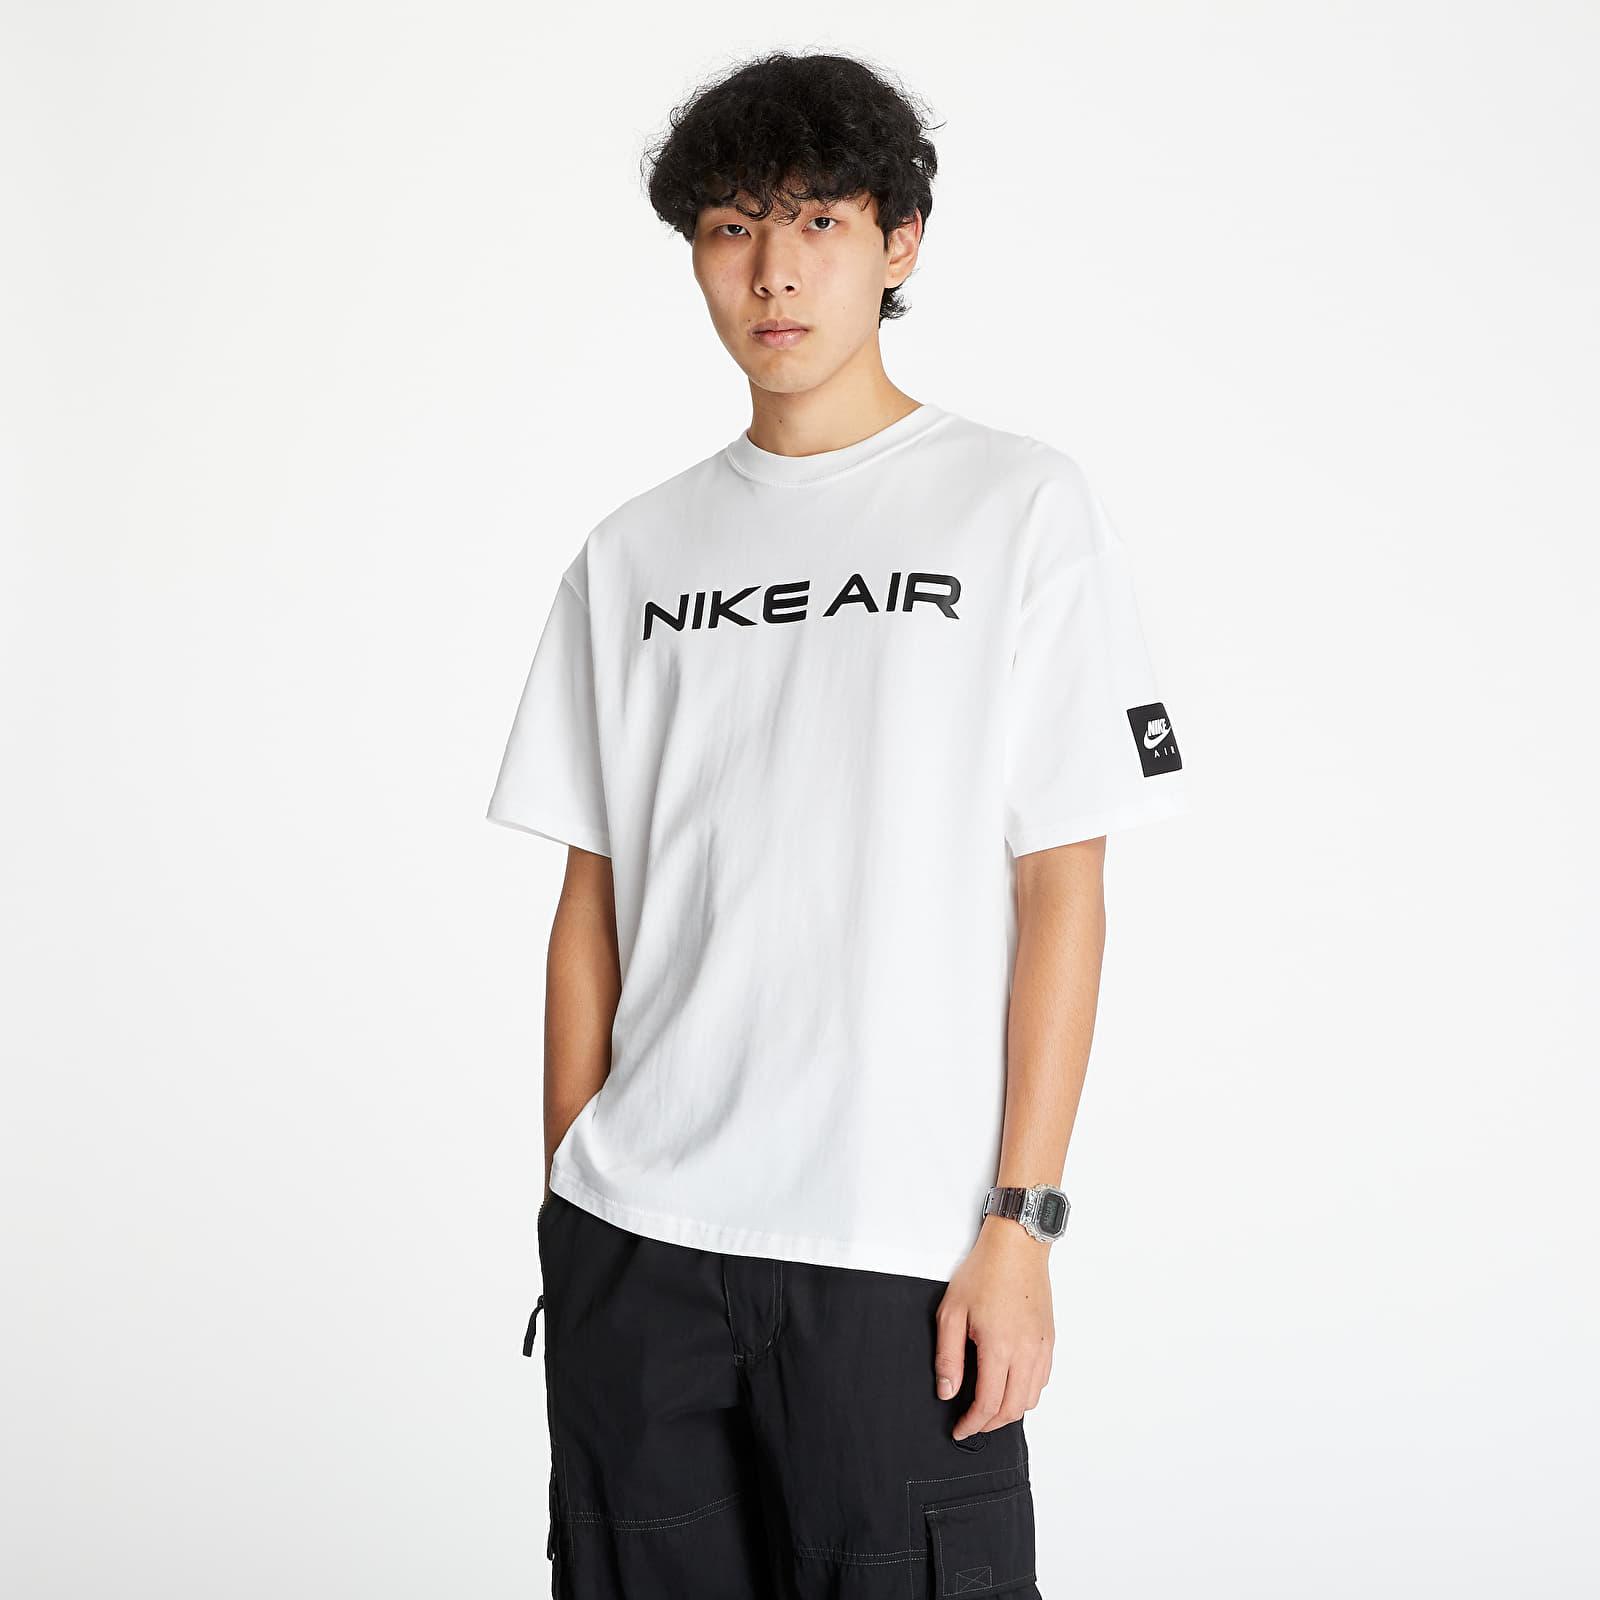 Tričká Nike Sportswear Tee Nike Air Hybrid White